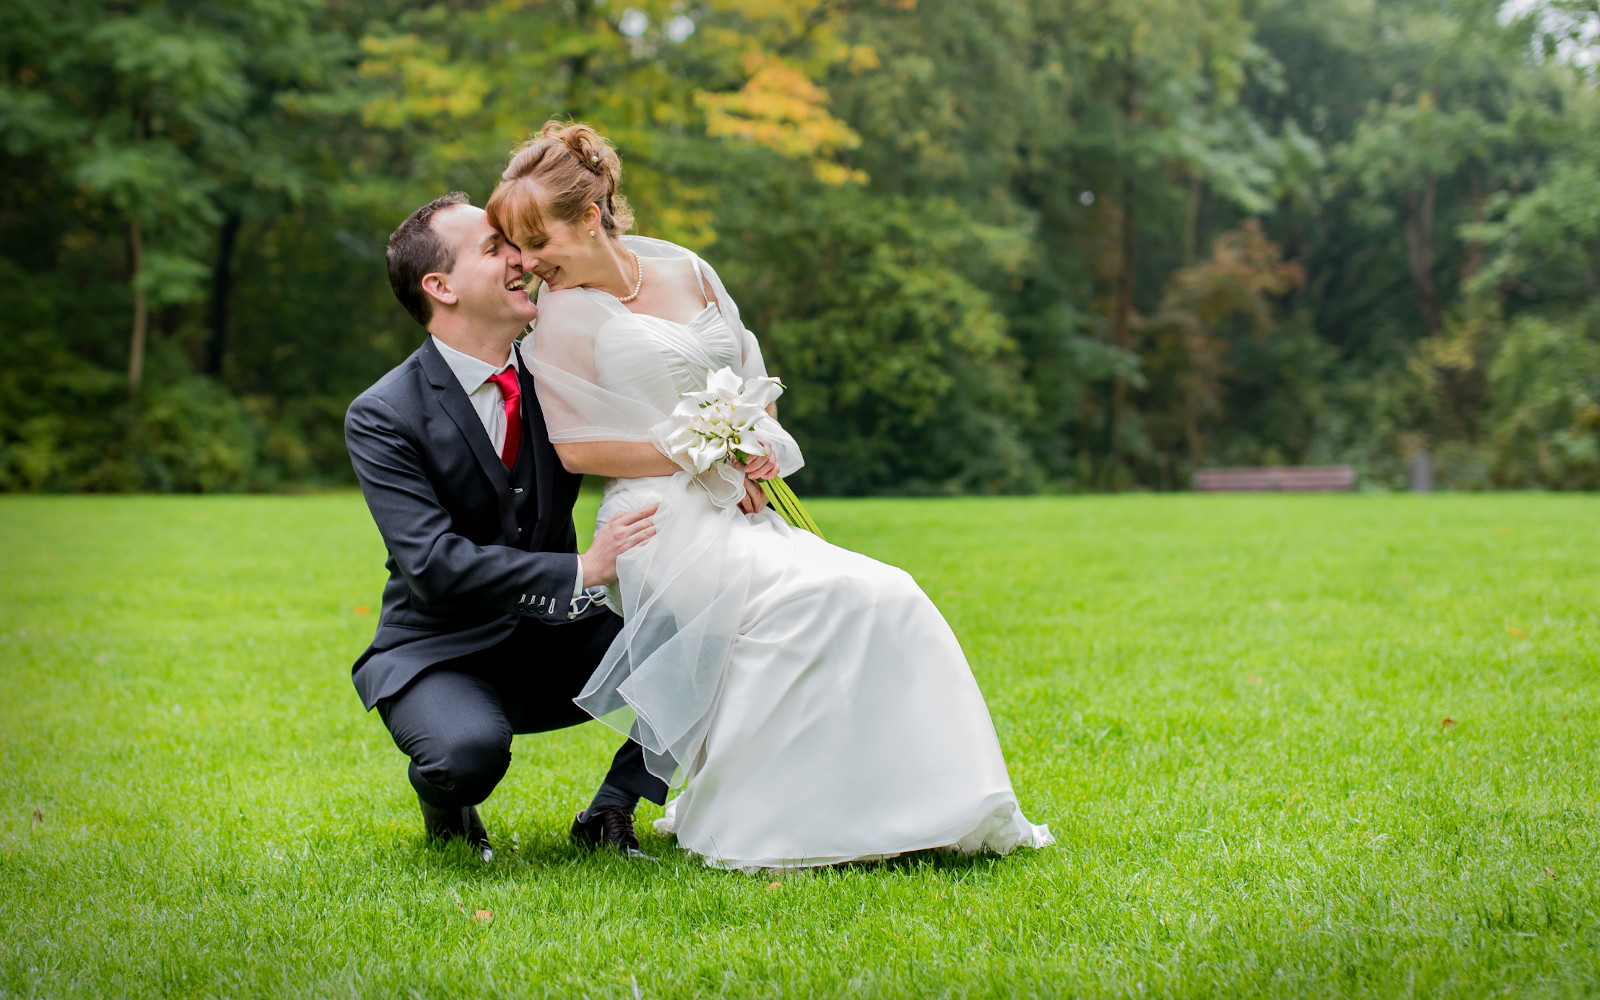 KaaTigo - Huwelijksfotografie